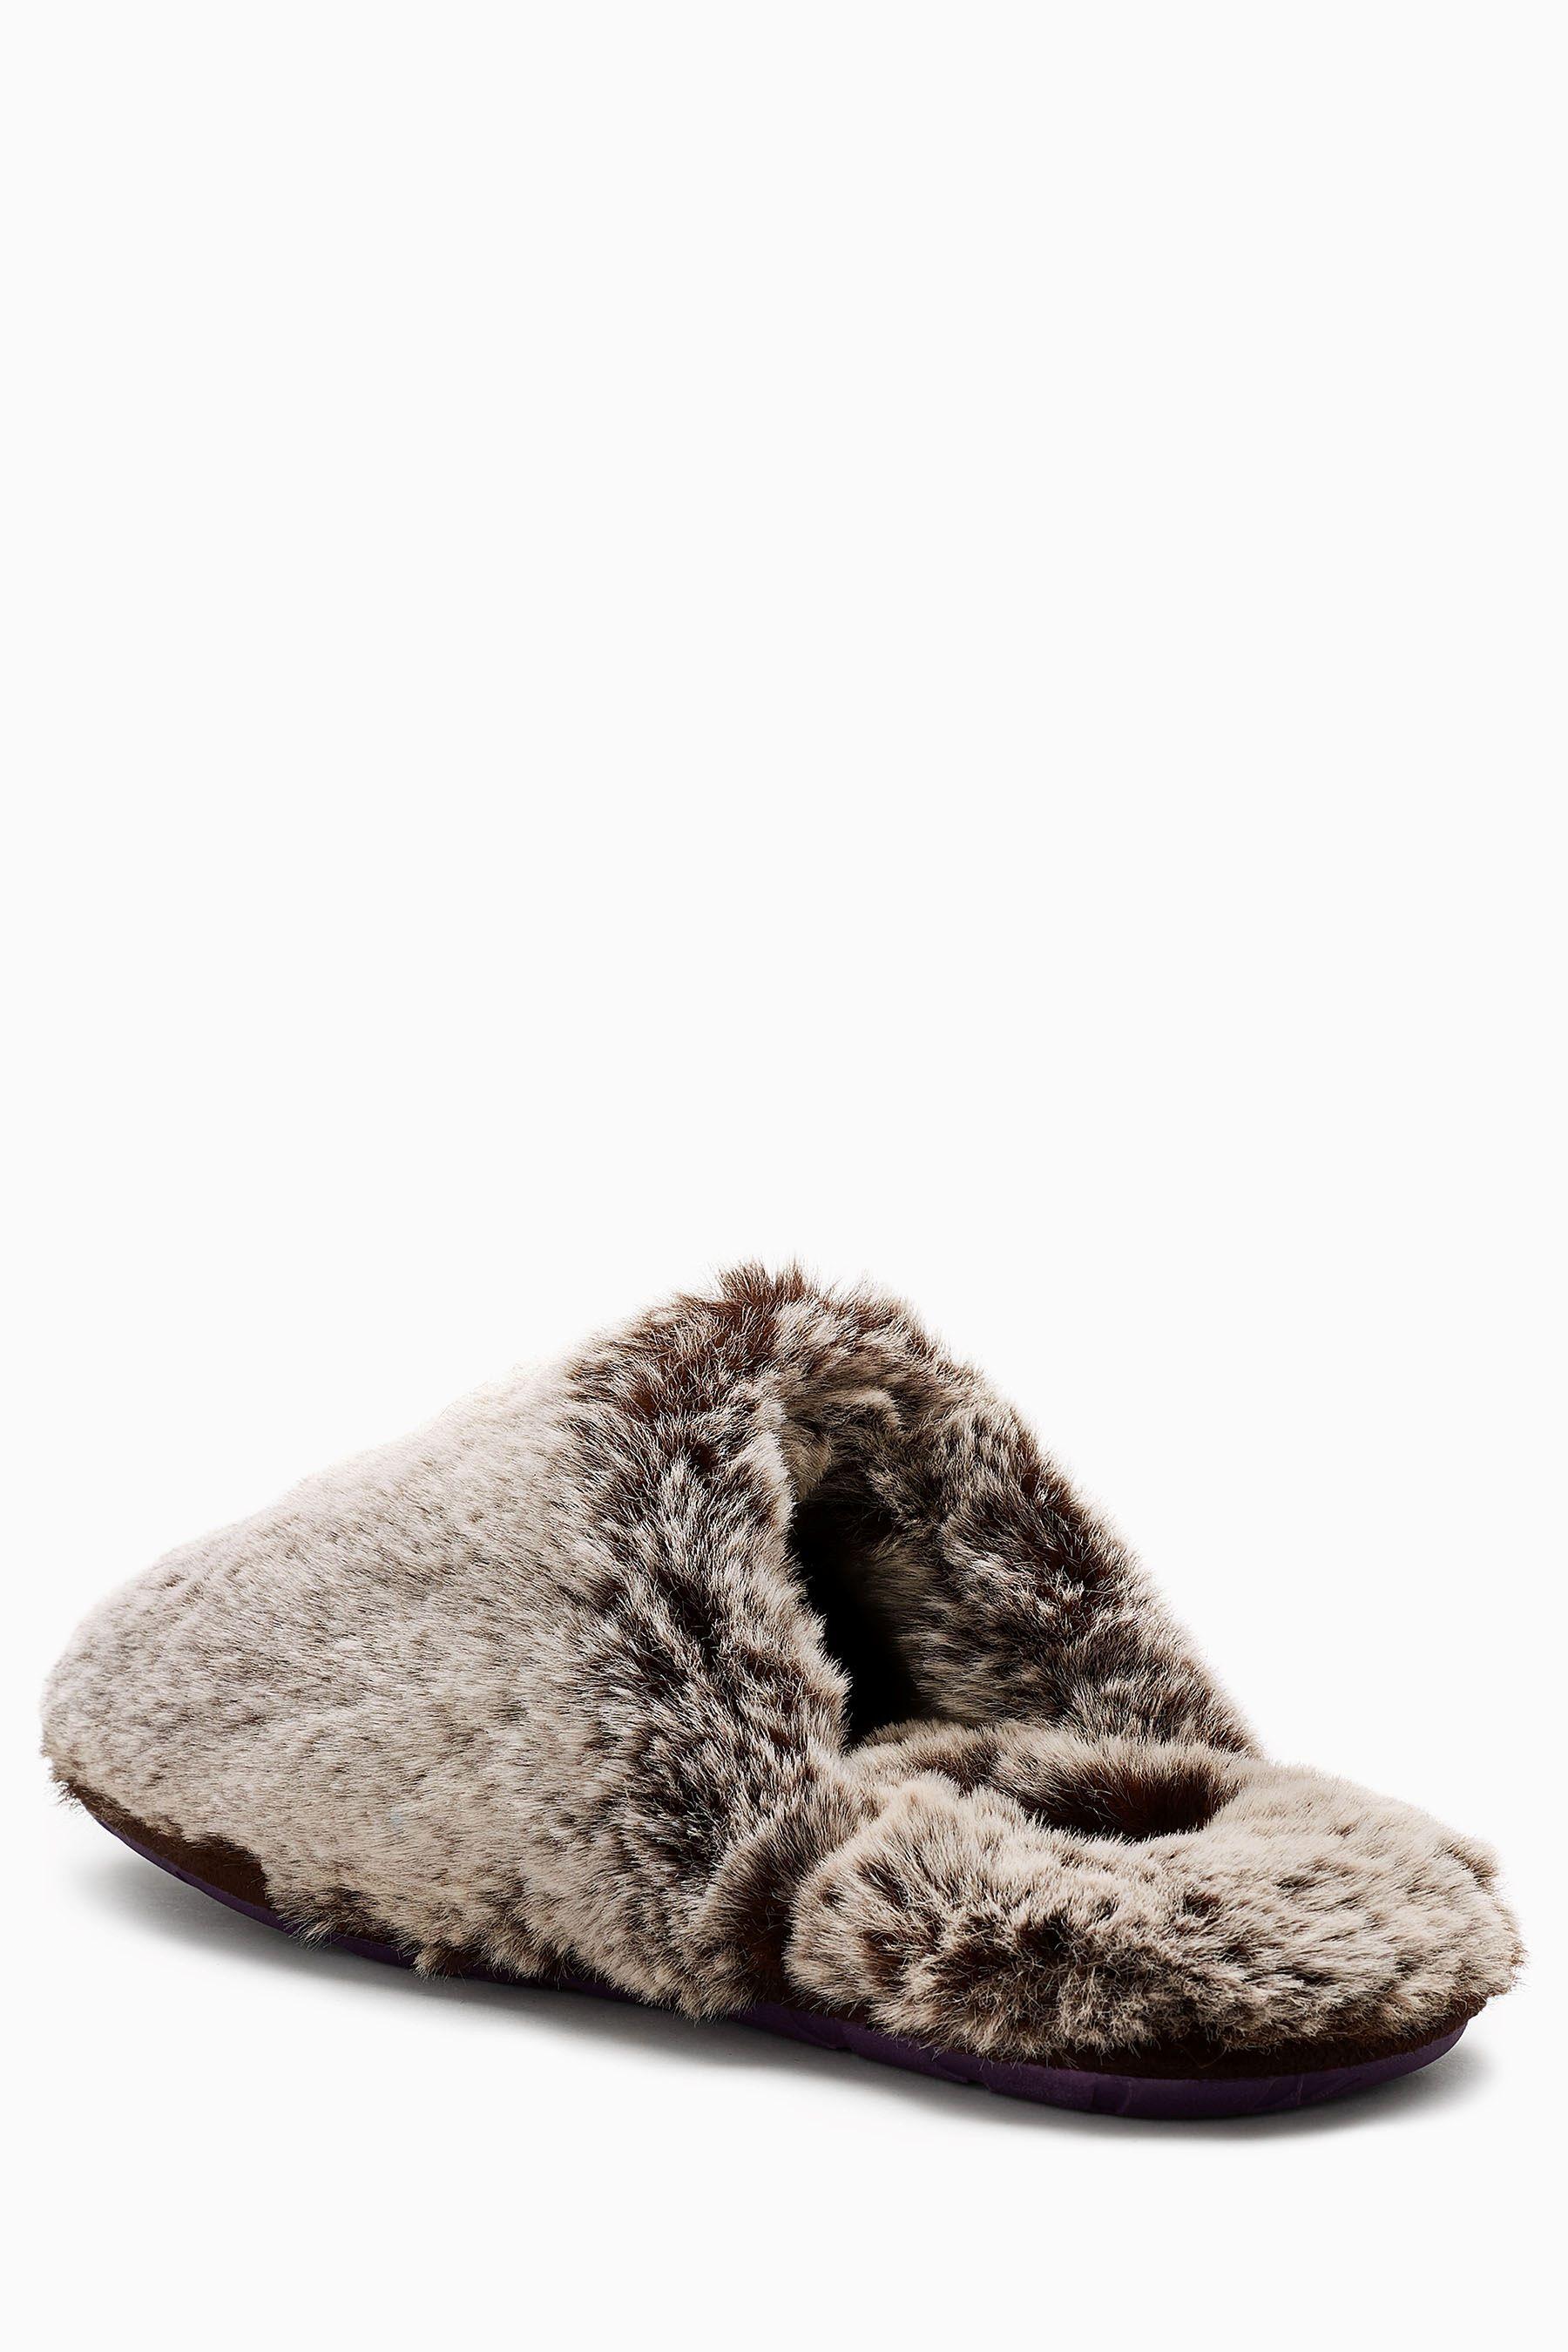 7ae2b9e63 Buy Ted Baker Grey Faux Fur Nnyah Mule Slipper from the Next UK online shop